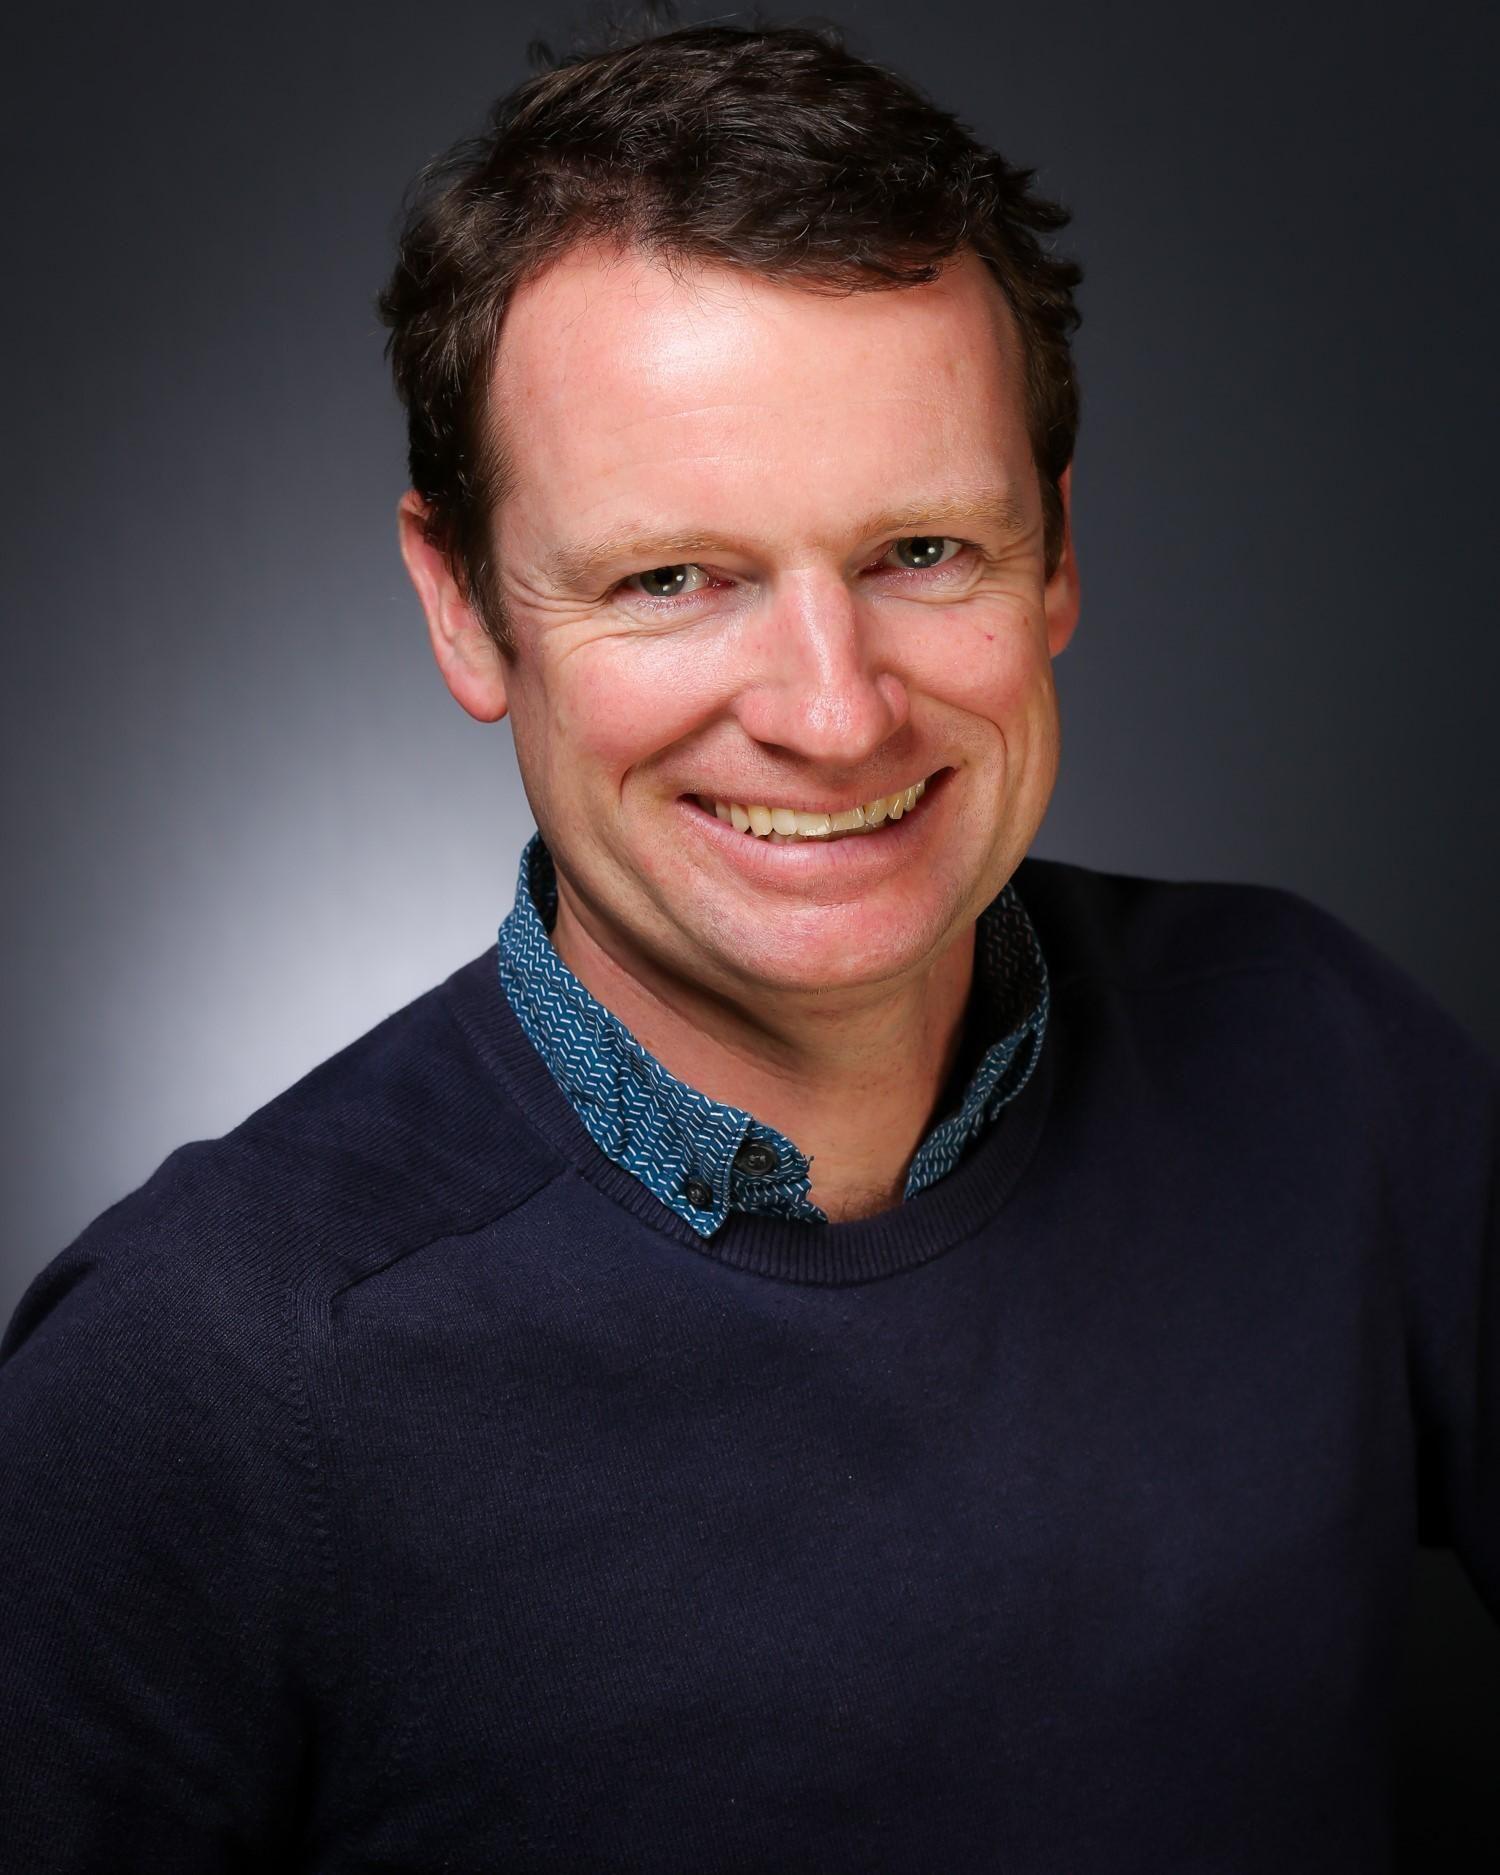 Tony Langford